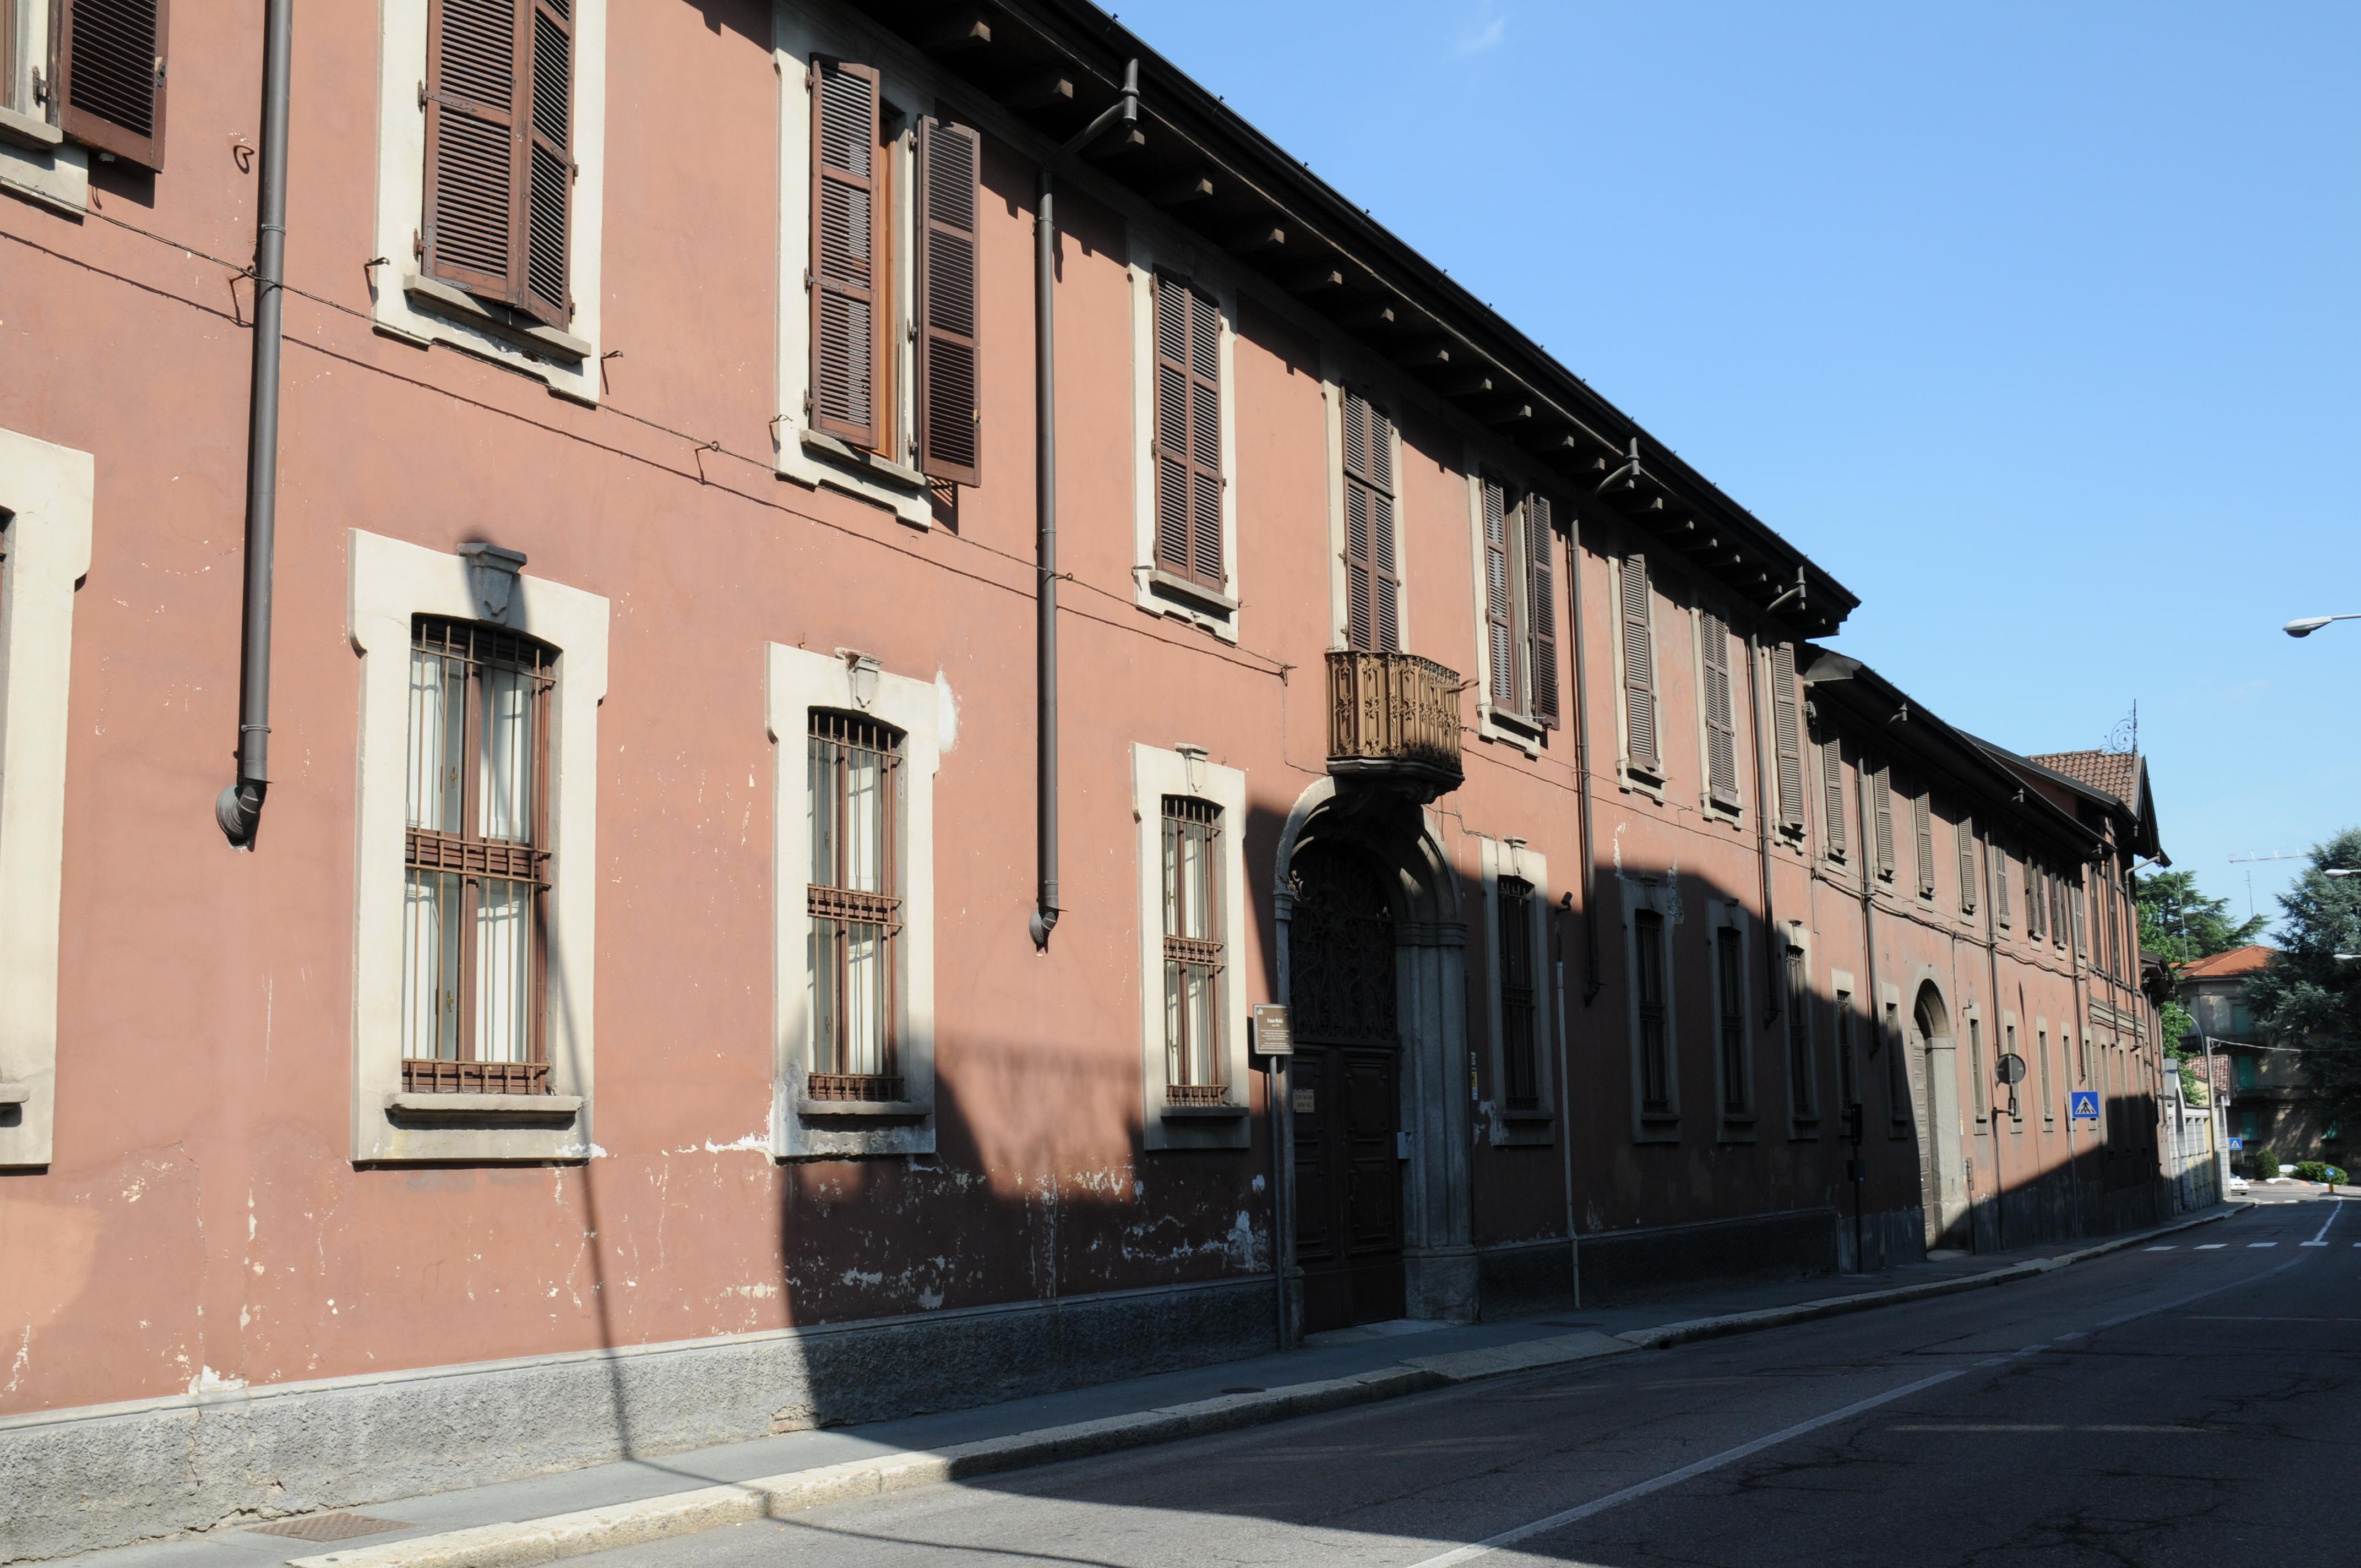 Mediglia Italy  city photos gallery : Istituto Melzi Legnano Wikimedia Commons